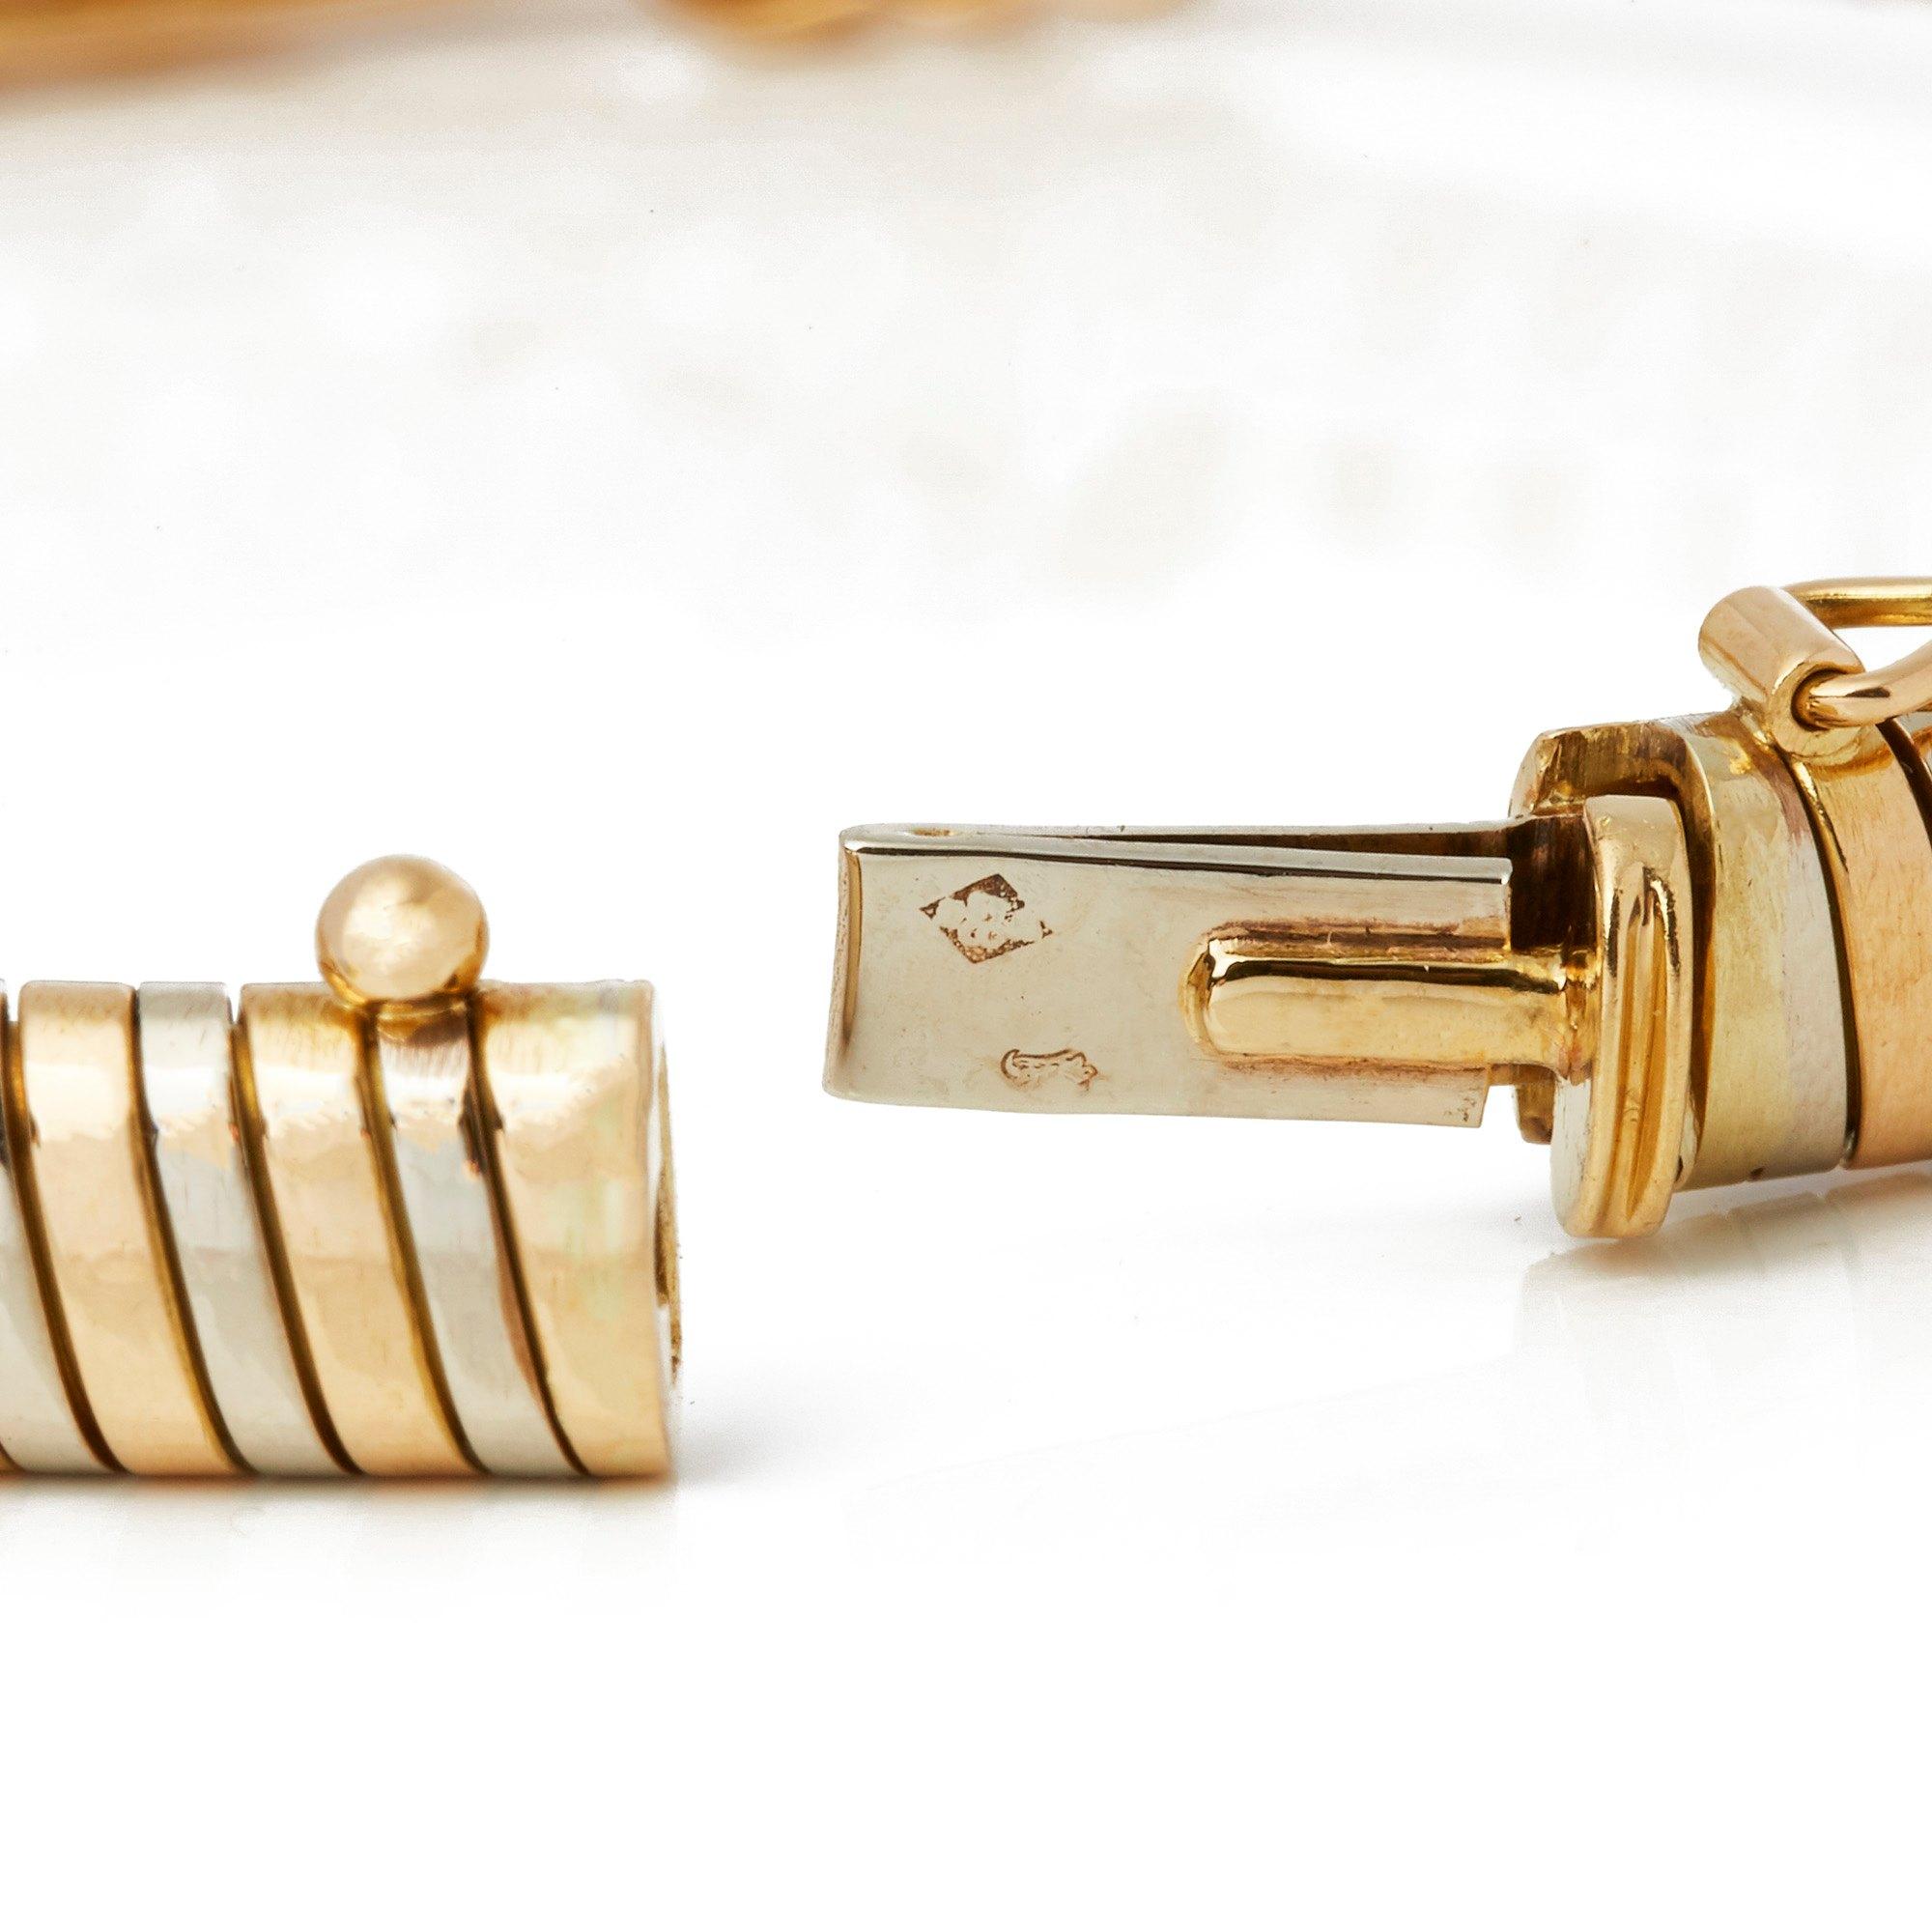 Cartier 18k Yellow Gold Turbogas Bracelet